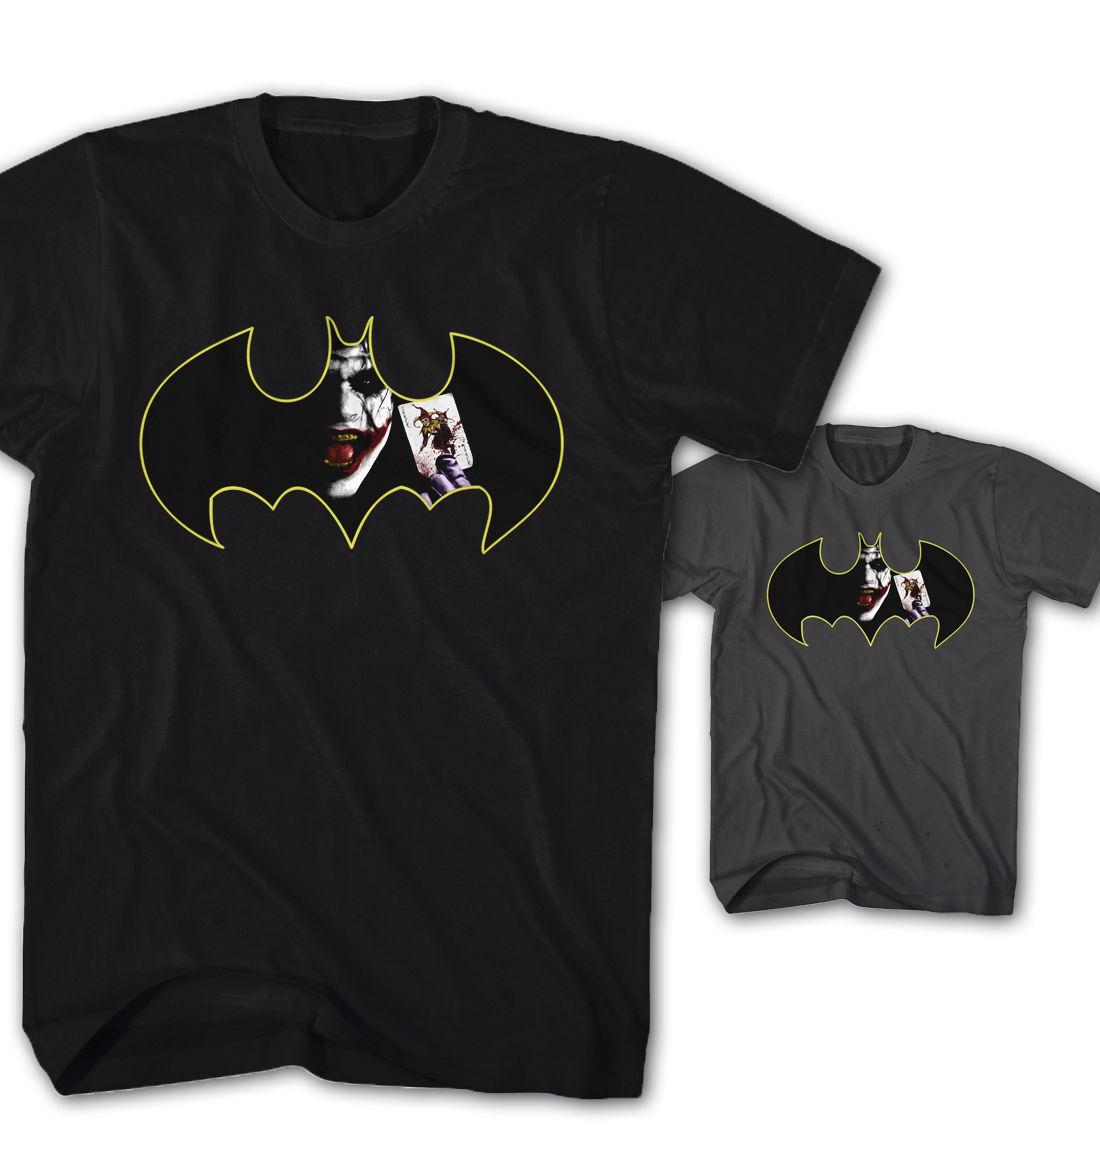 BATMAN INSPIRED DARK KNIGHT JOKER FILM MOVIE TAXI SERVICE BATMOBILE 2 T SHIRT